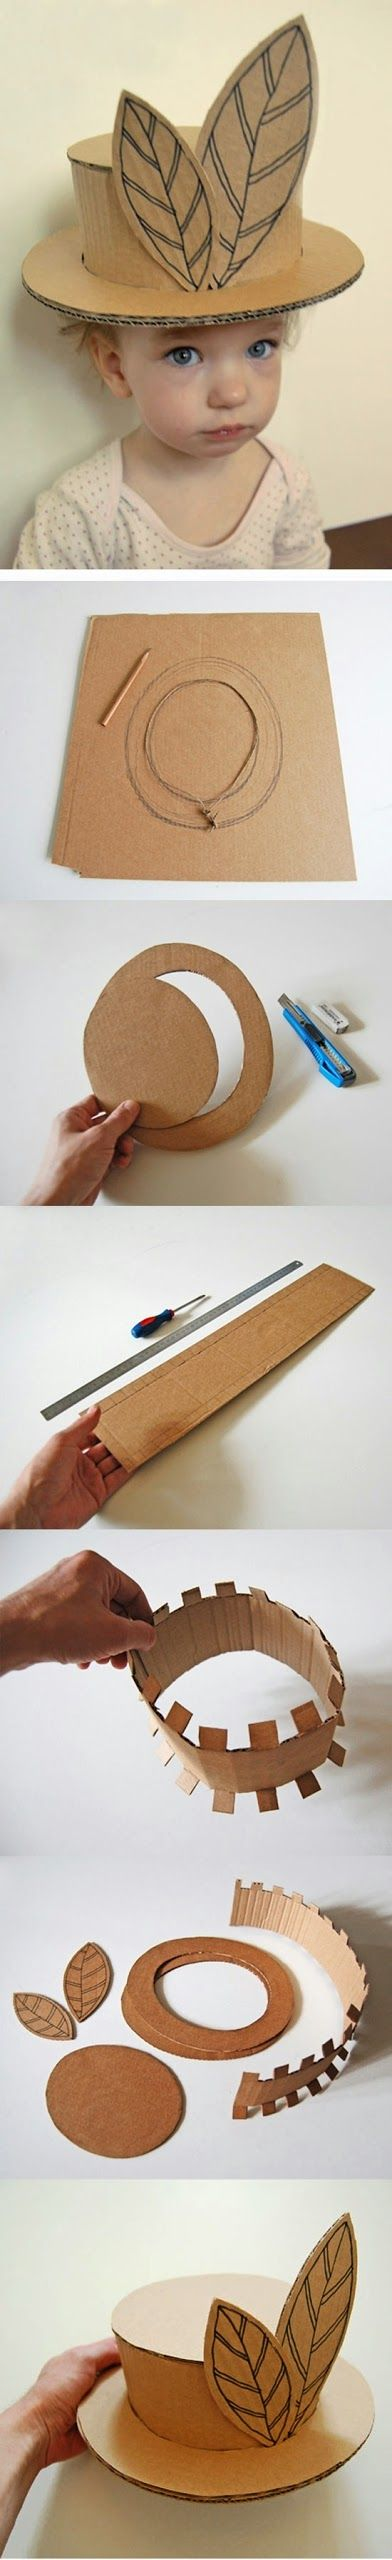 DIY: Projet carton badine le chapeau